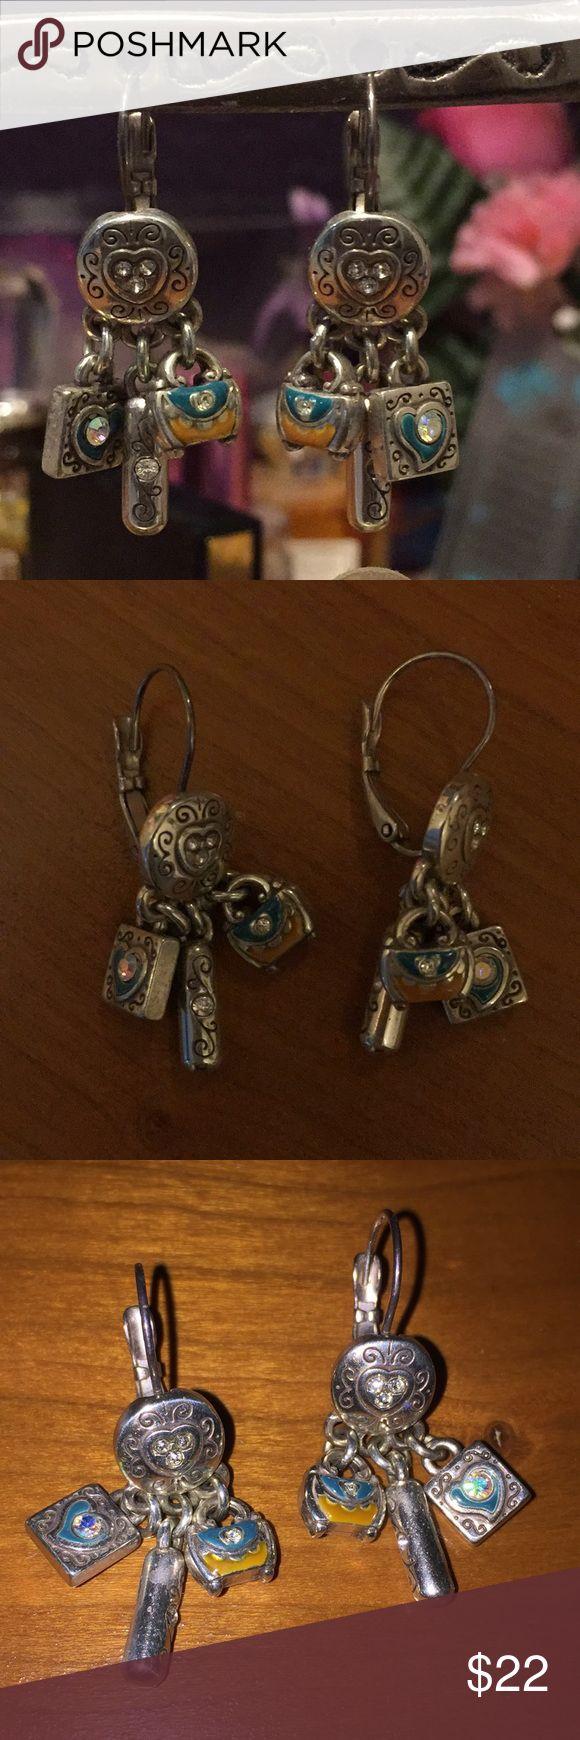 Earrings Very beautiful Brighton earrings. Go with everything! Brighton Jewelry Earrings